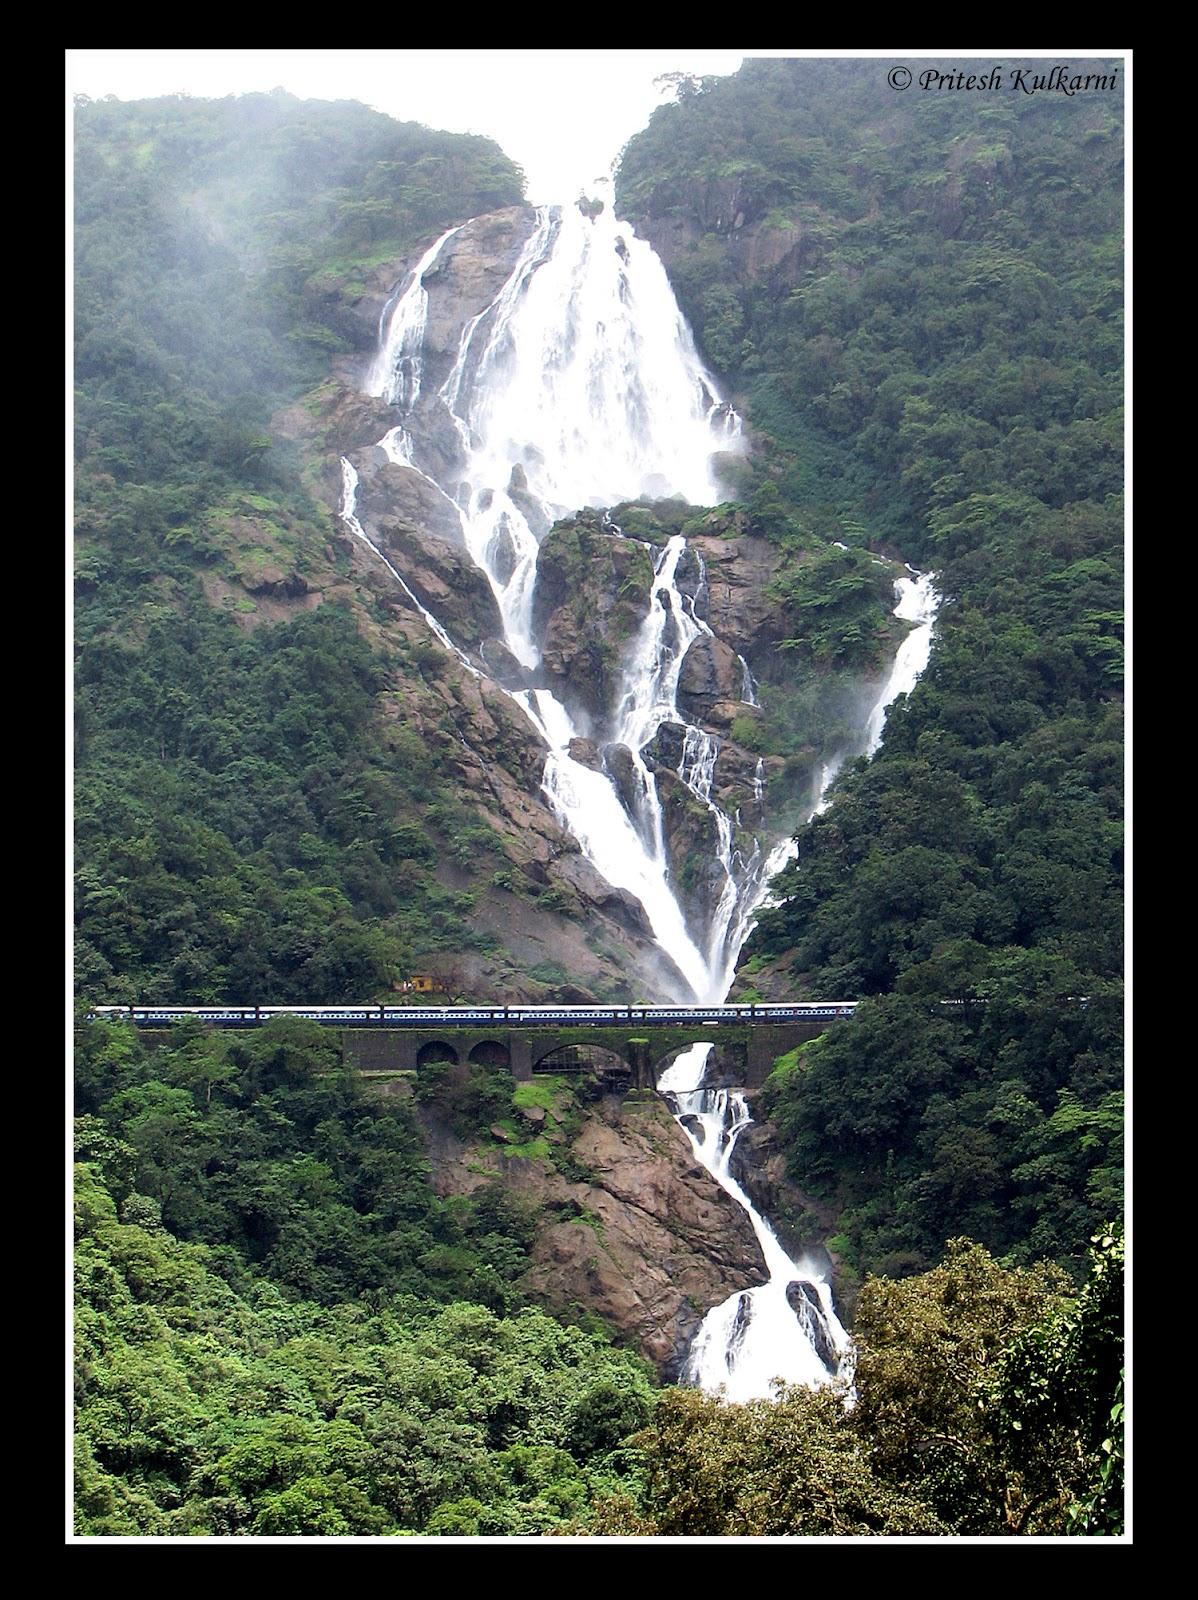 Goa Train Waterfall Train in Dudhsagar Waterfall